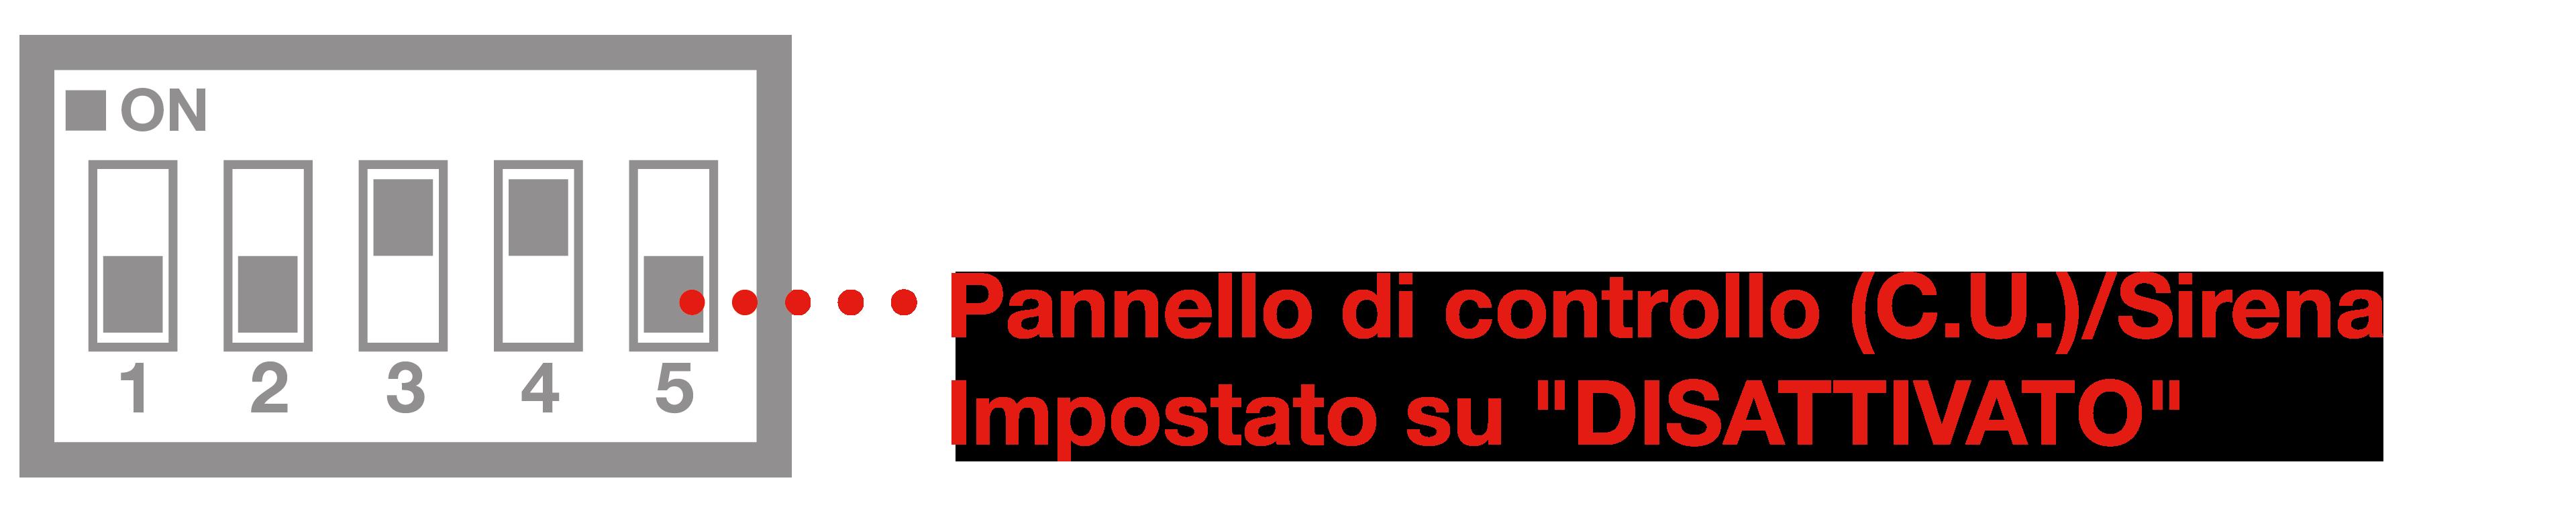 BSS_CONTROL_PANEL_IT